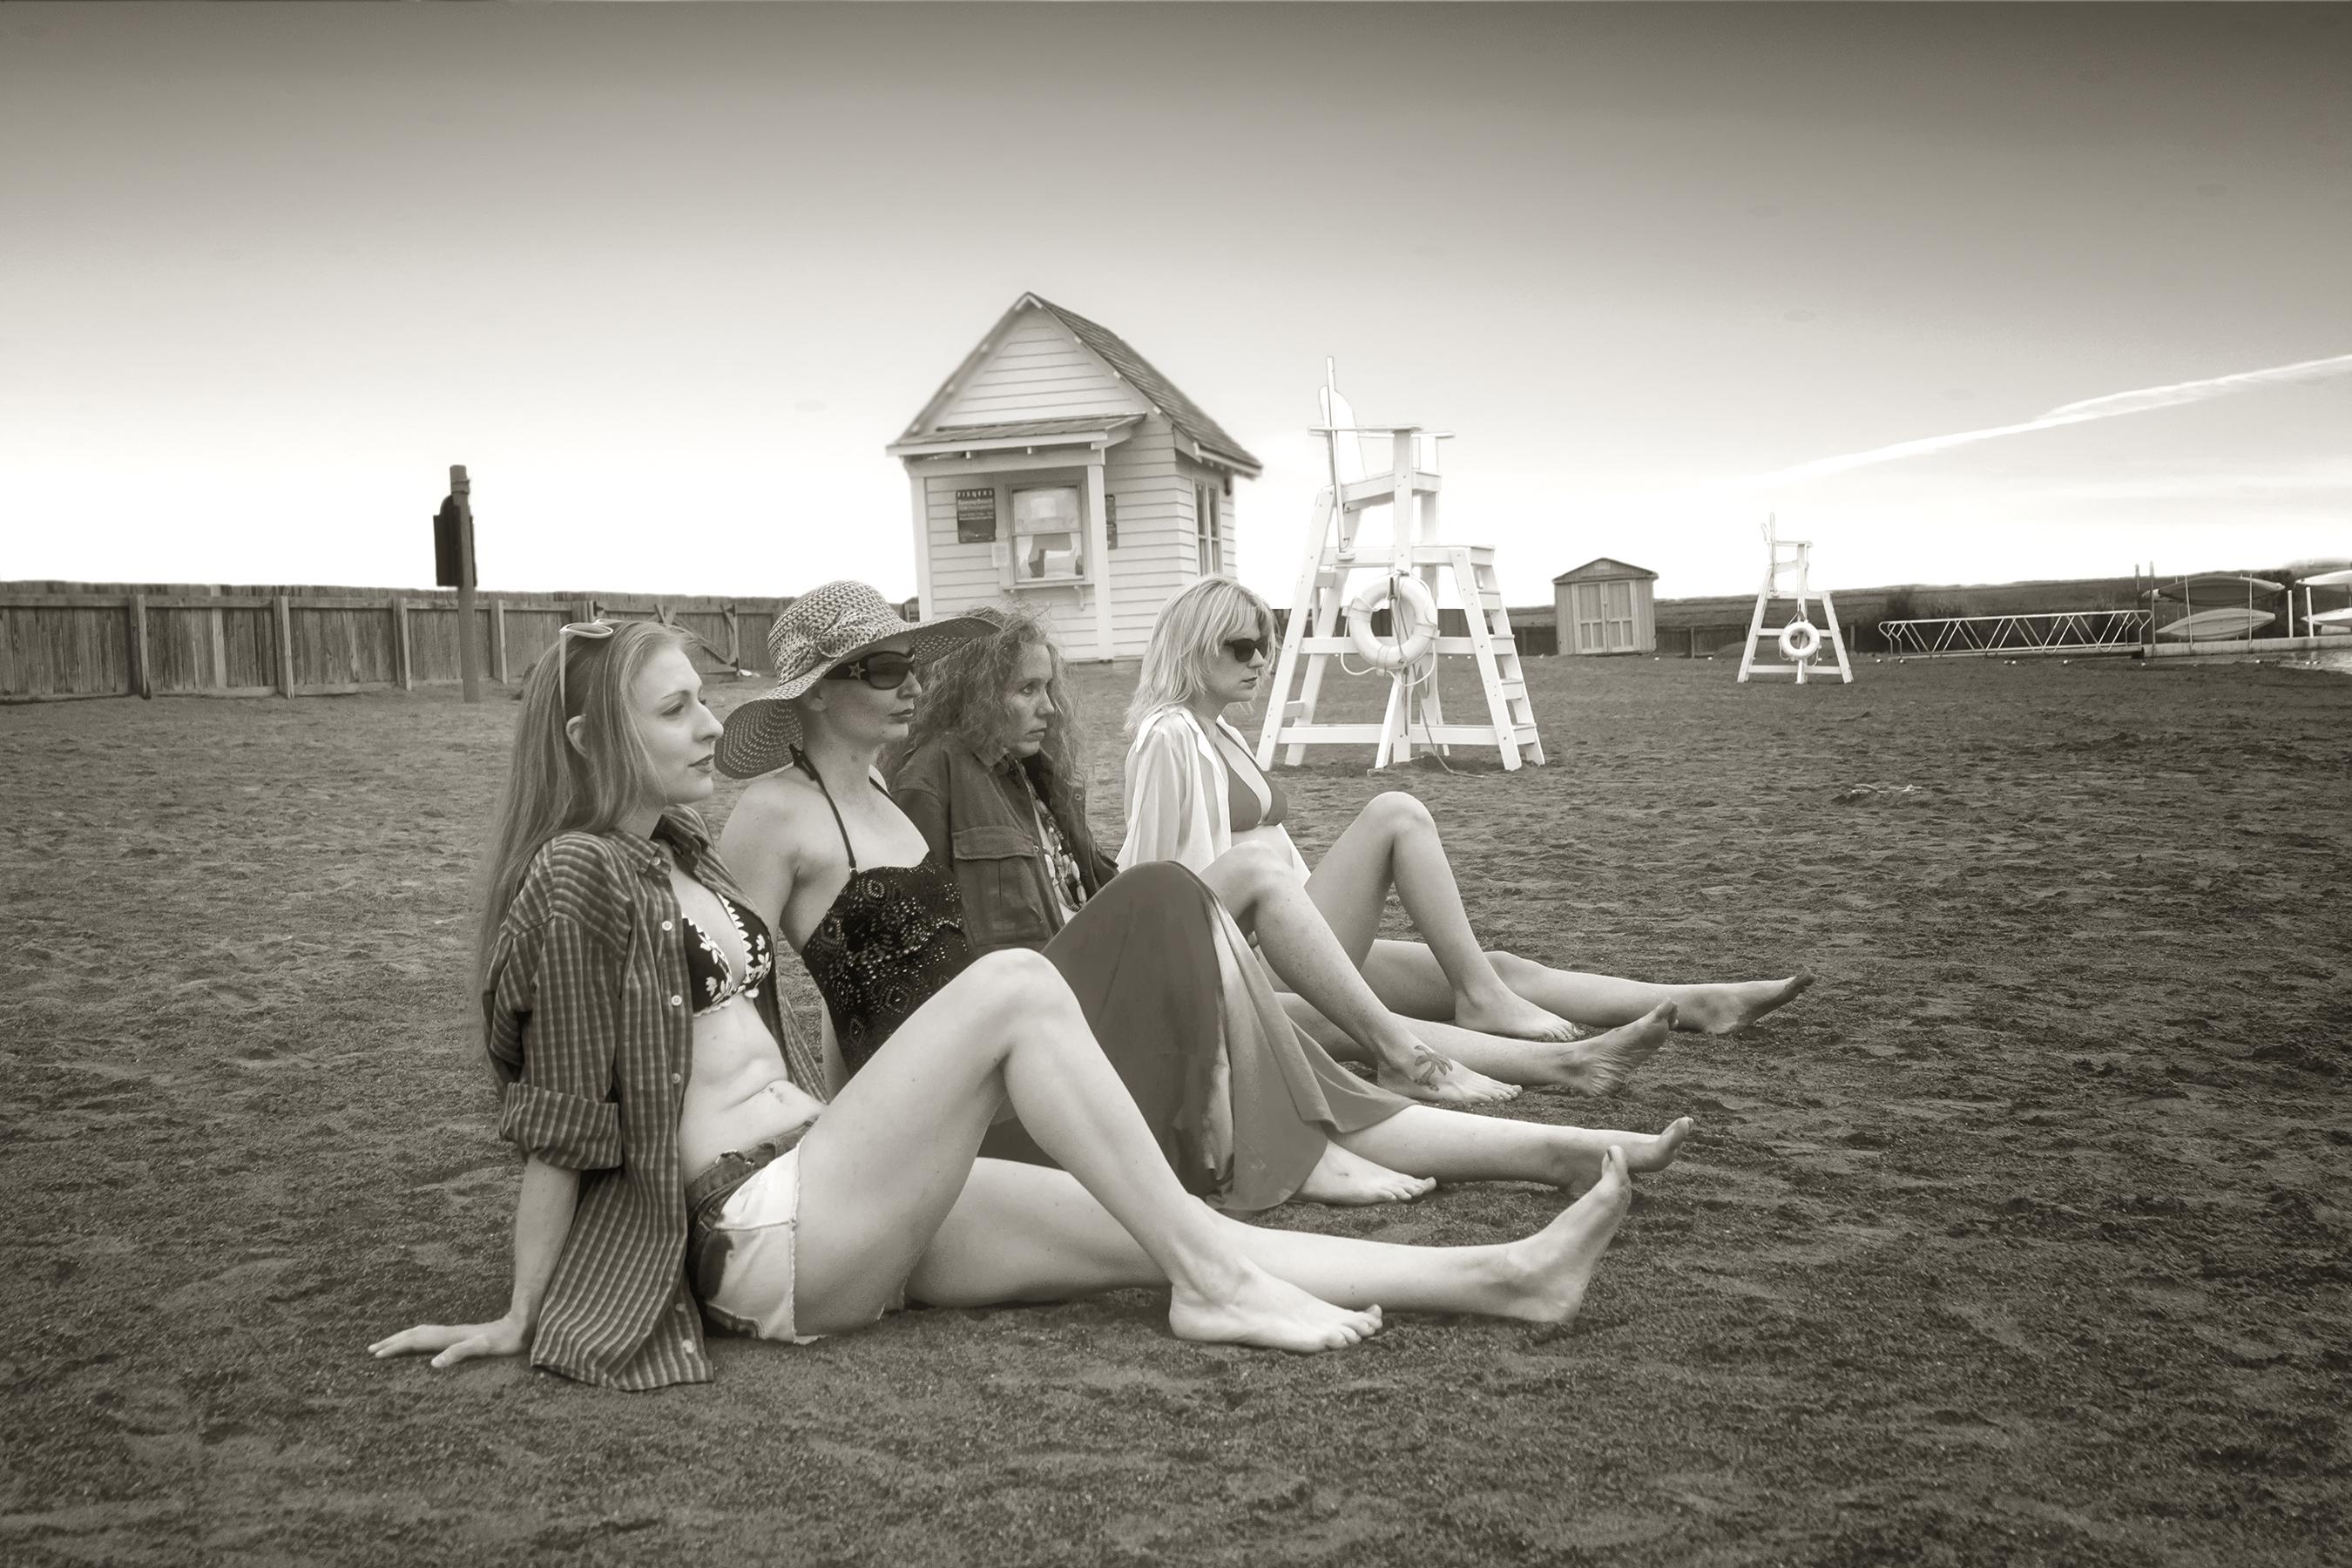 charles i. letbetter - suburban beach